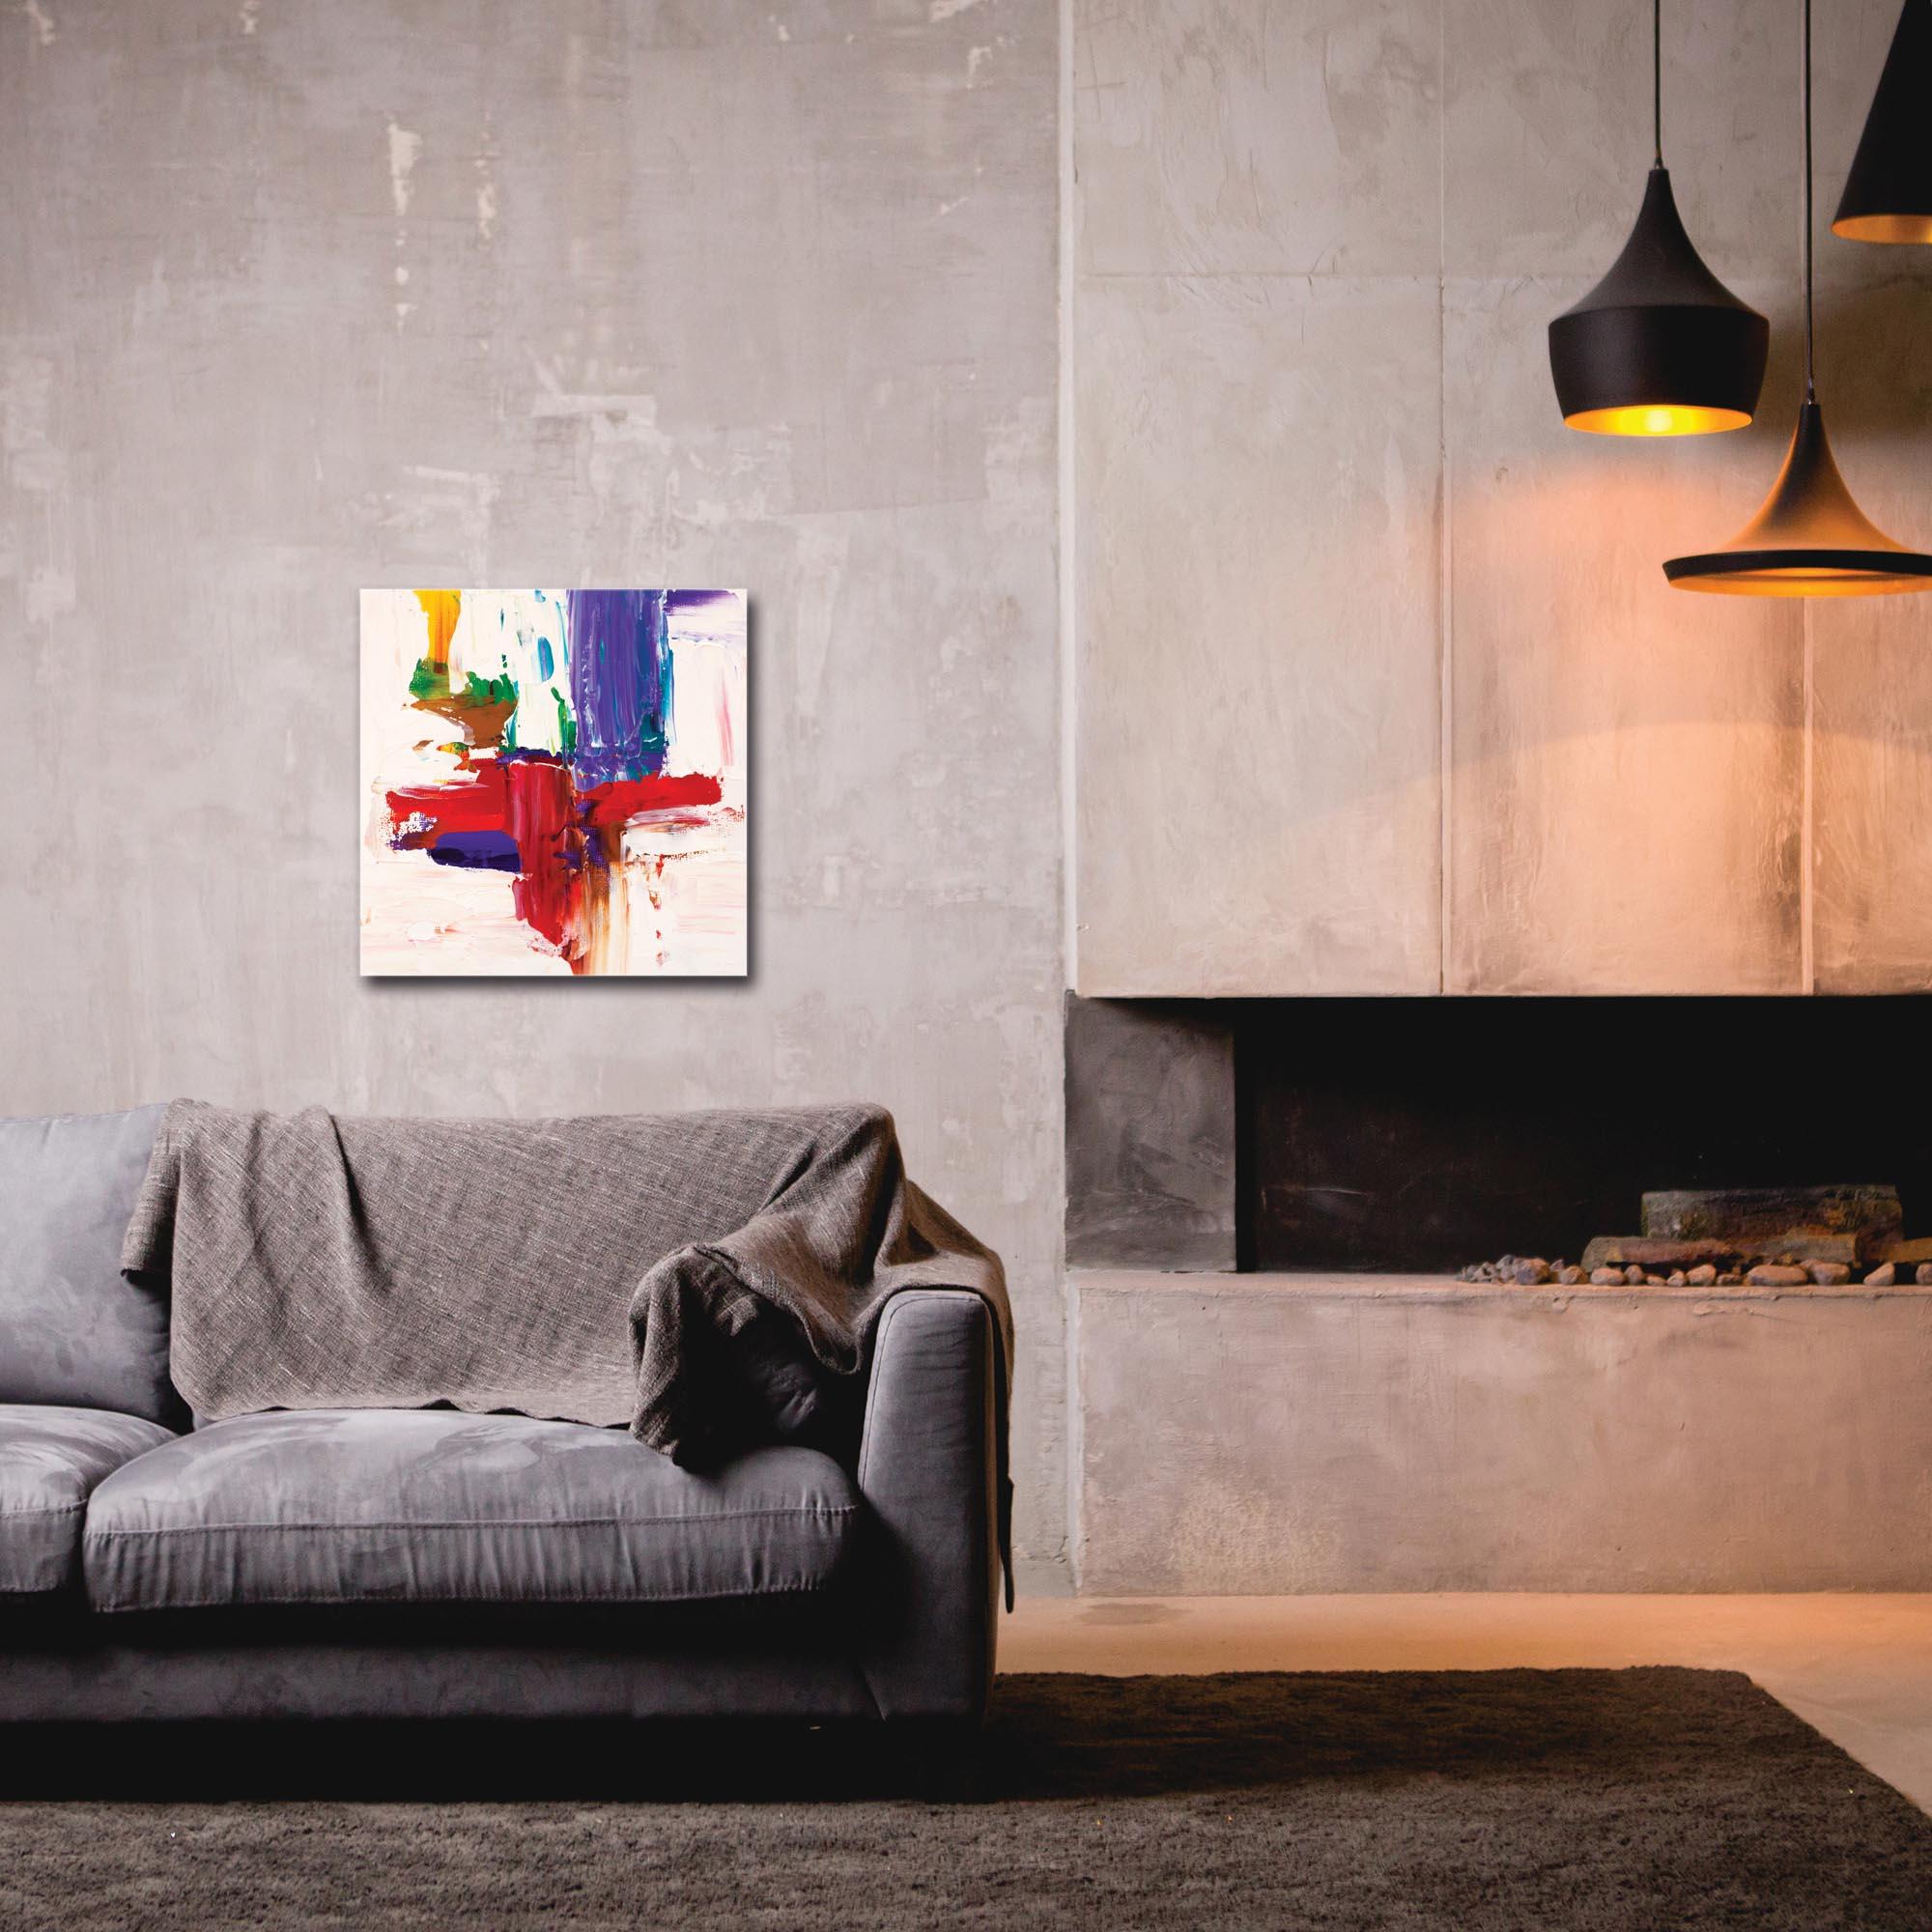 Abstract Wall Art 'Urban Life 10' - Urban Decor on Metal or Plexiglass - Image 3